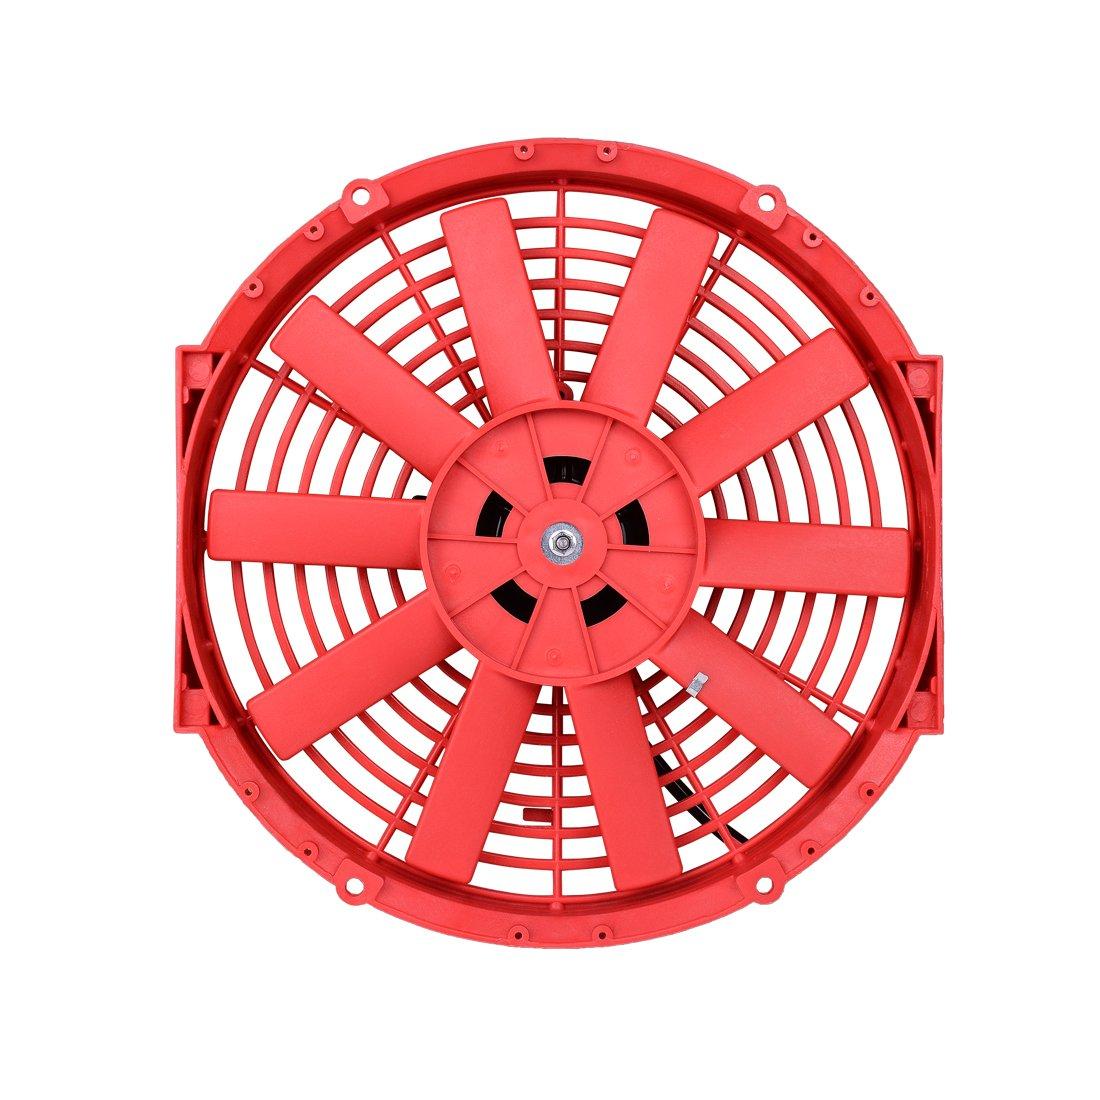 12 High Performance Electric Cooling Fan Push Pull Zirgo Wiring Diagram Radiator Slim 12v 80w 1550 Cfm With Mounting Kitdiameter Depth 256